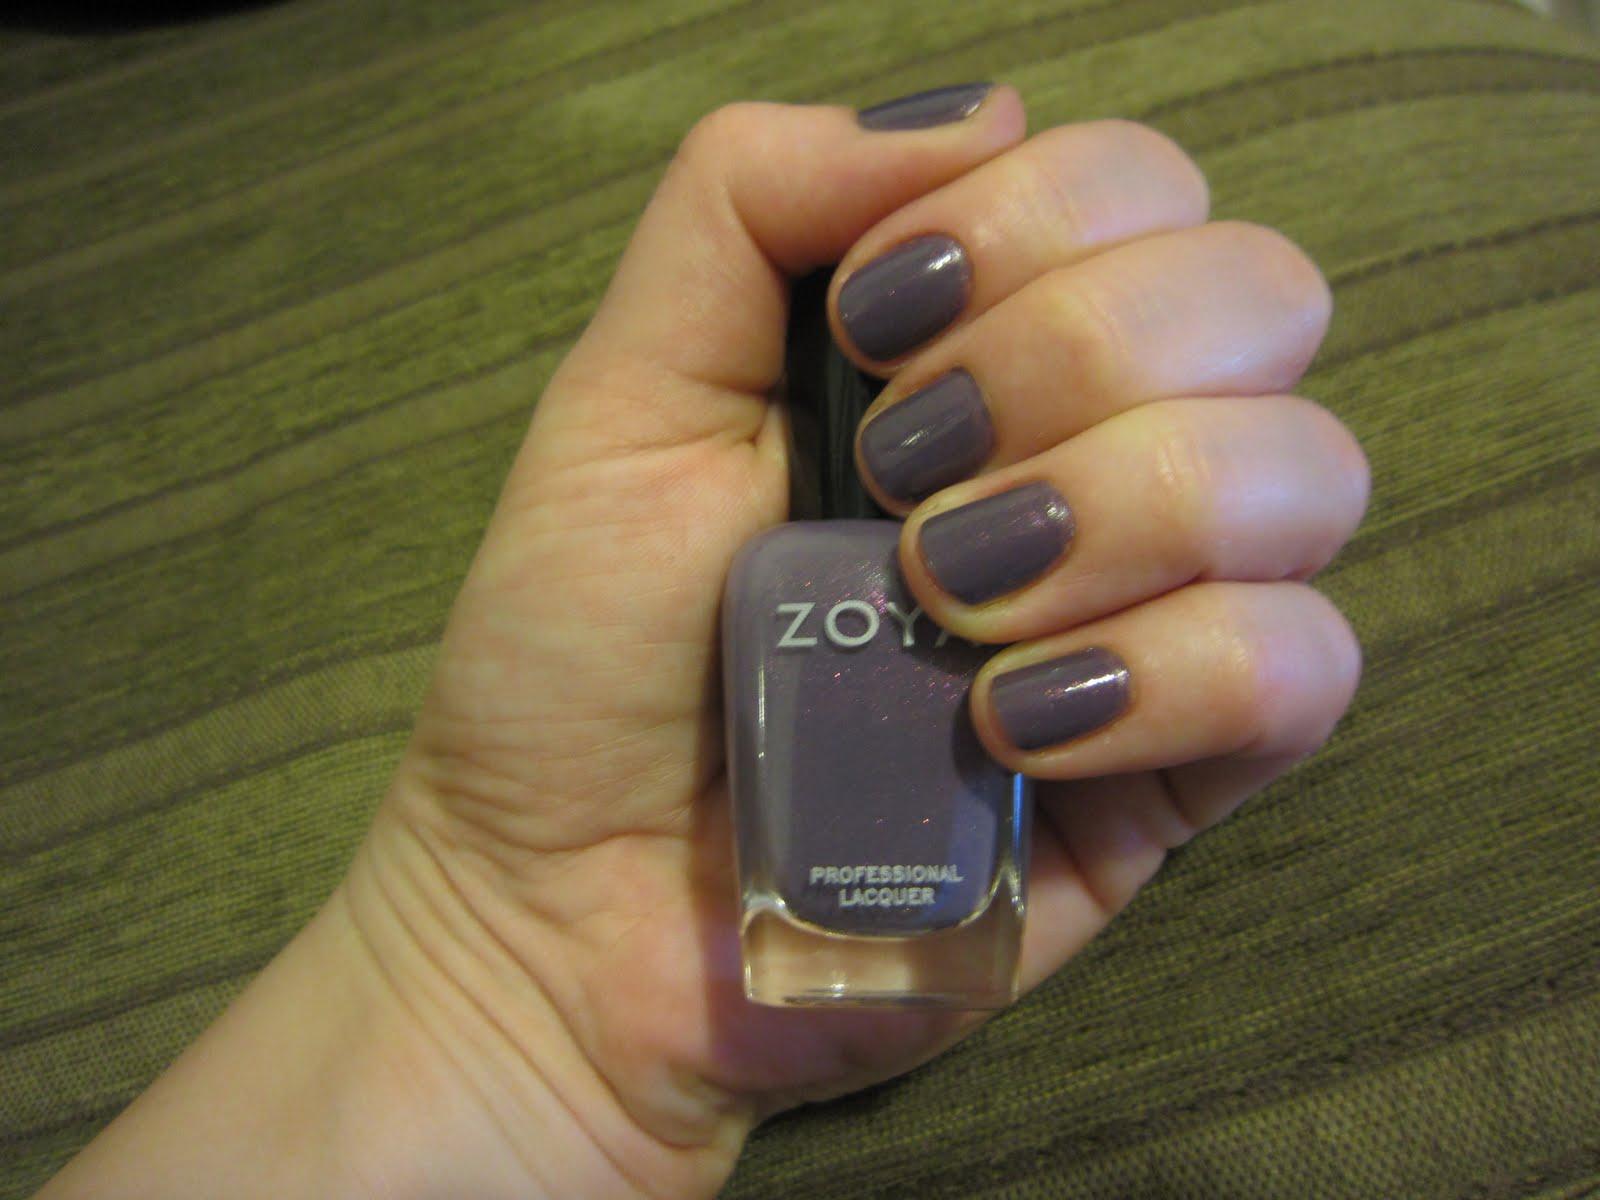 The Beauty of Life: Mani of the Week: Zoya Lotus